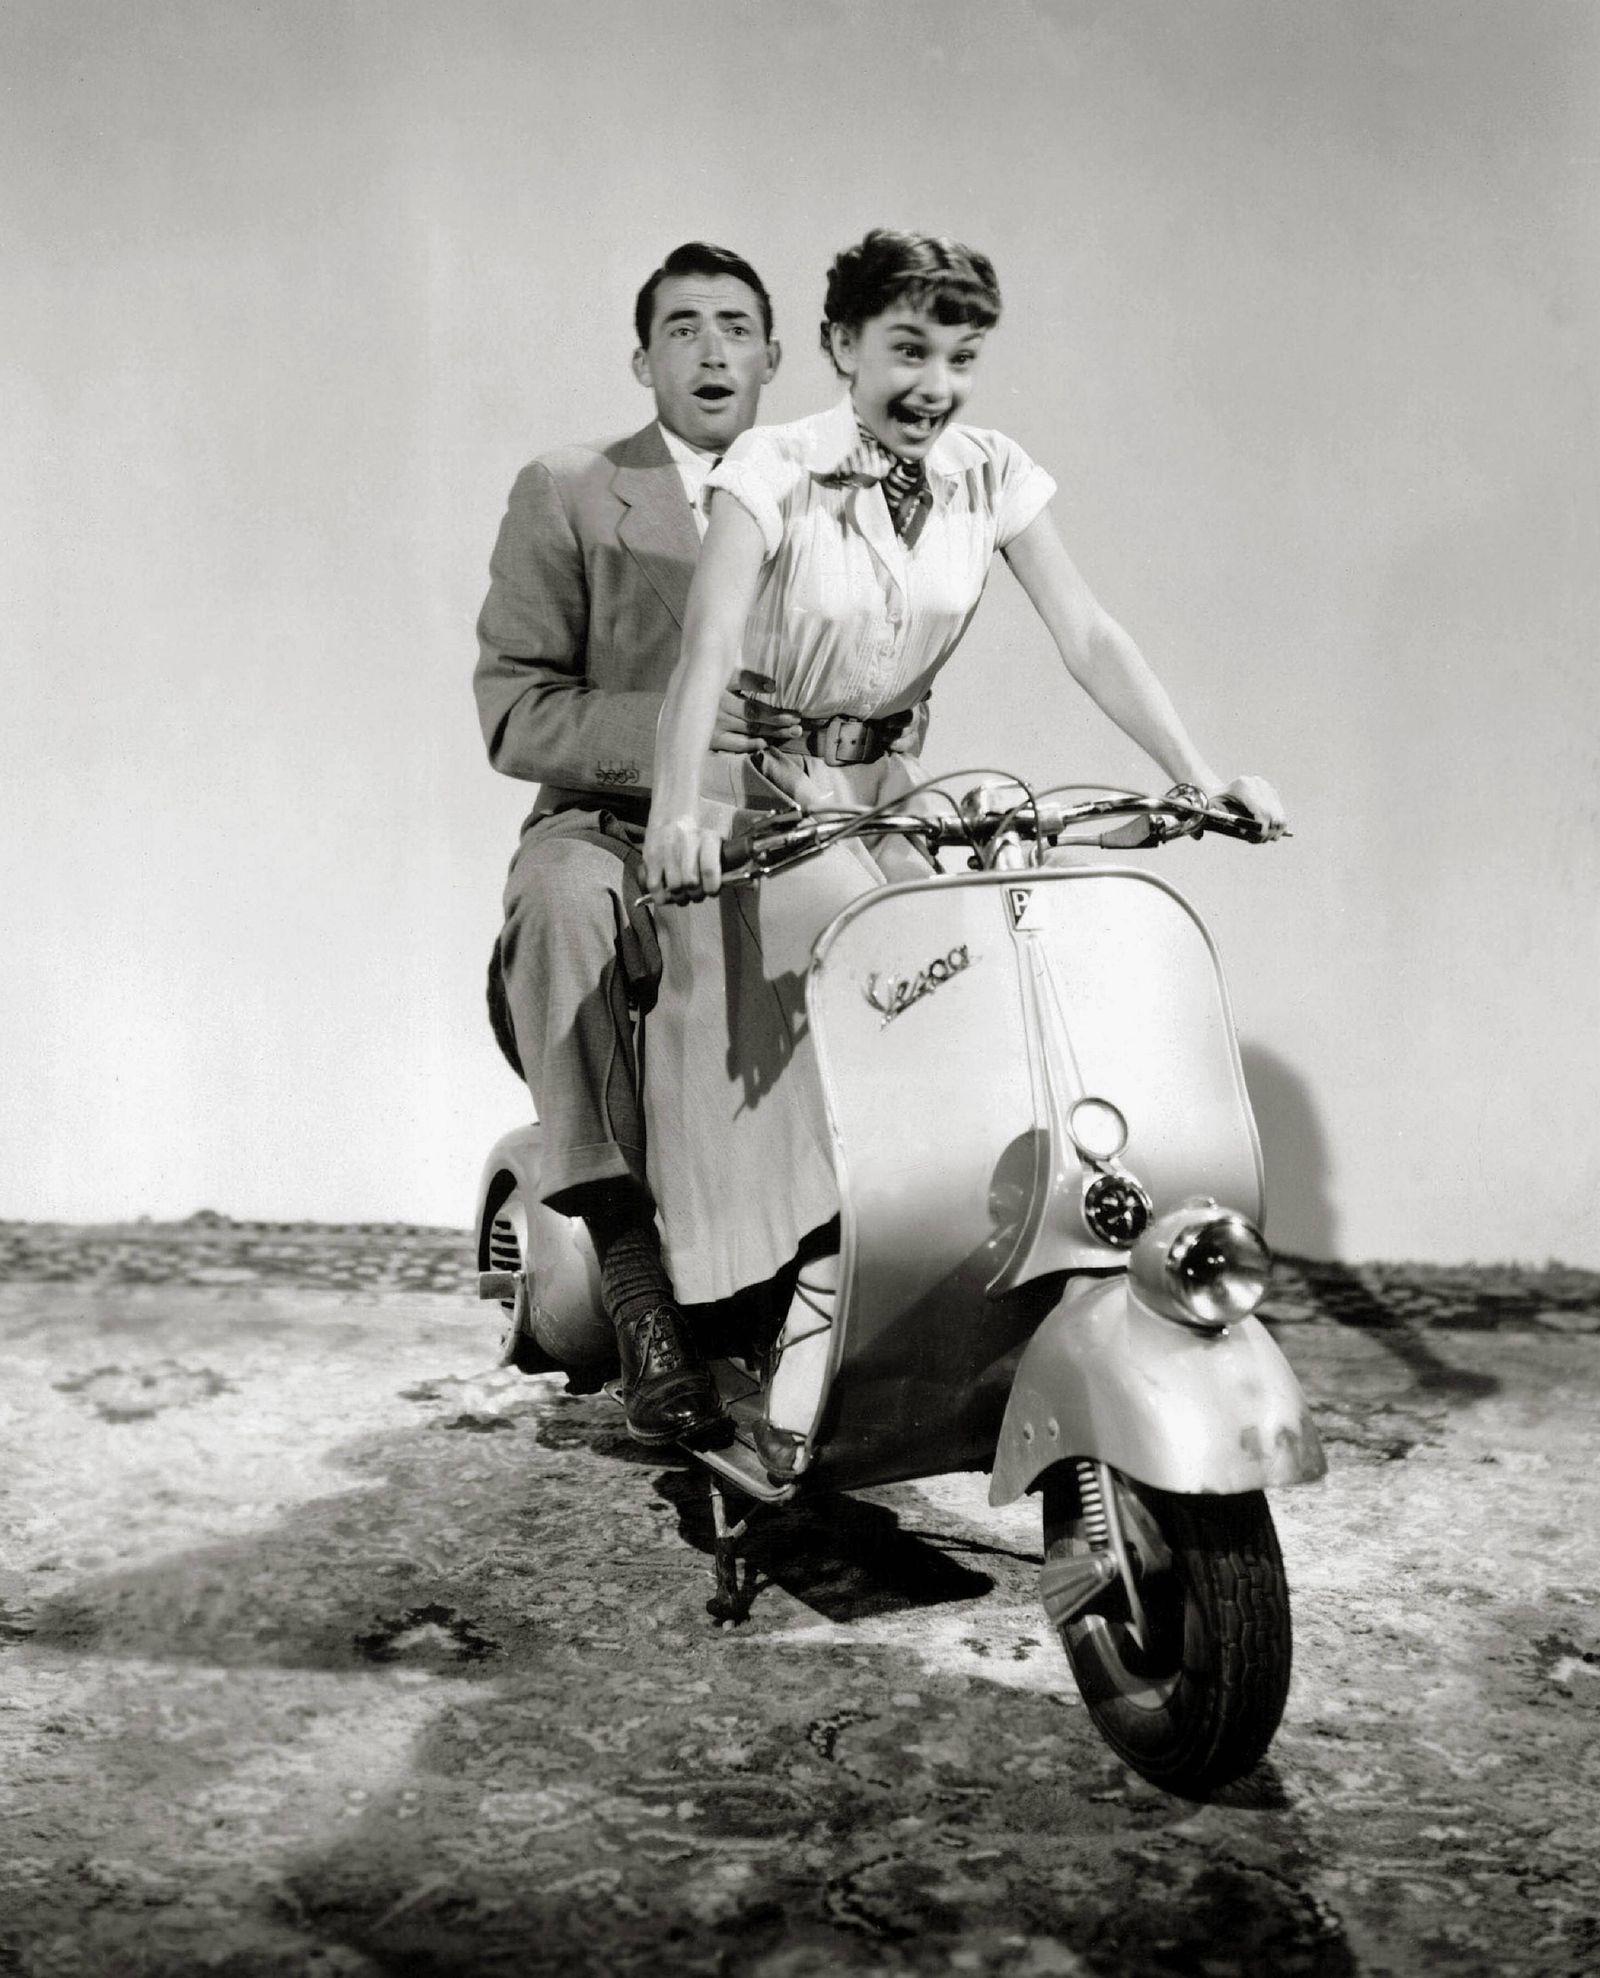 Audrey Hepburn and Gregory Peck Roman Holiday 1953 Paramount PUBLICATIONxINxGERxSUIxAUTxONLY Copyri